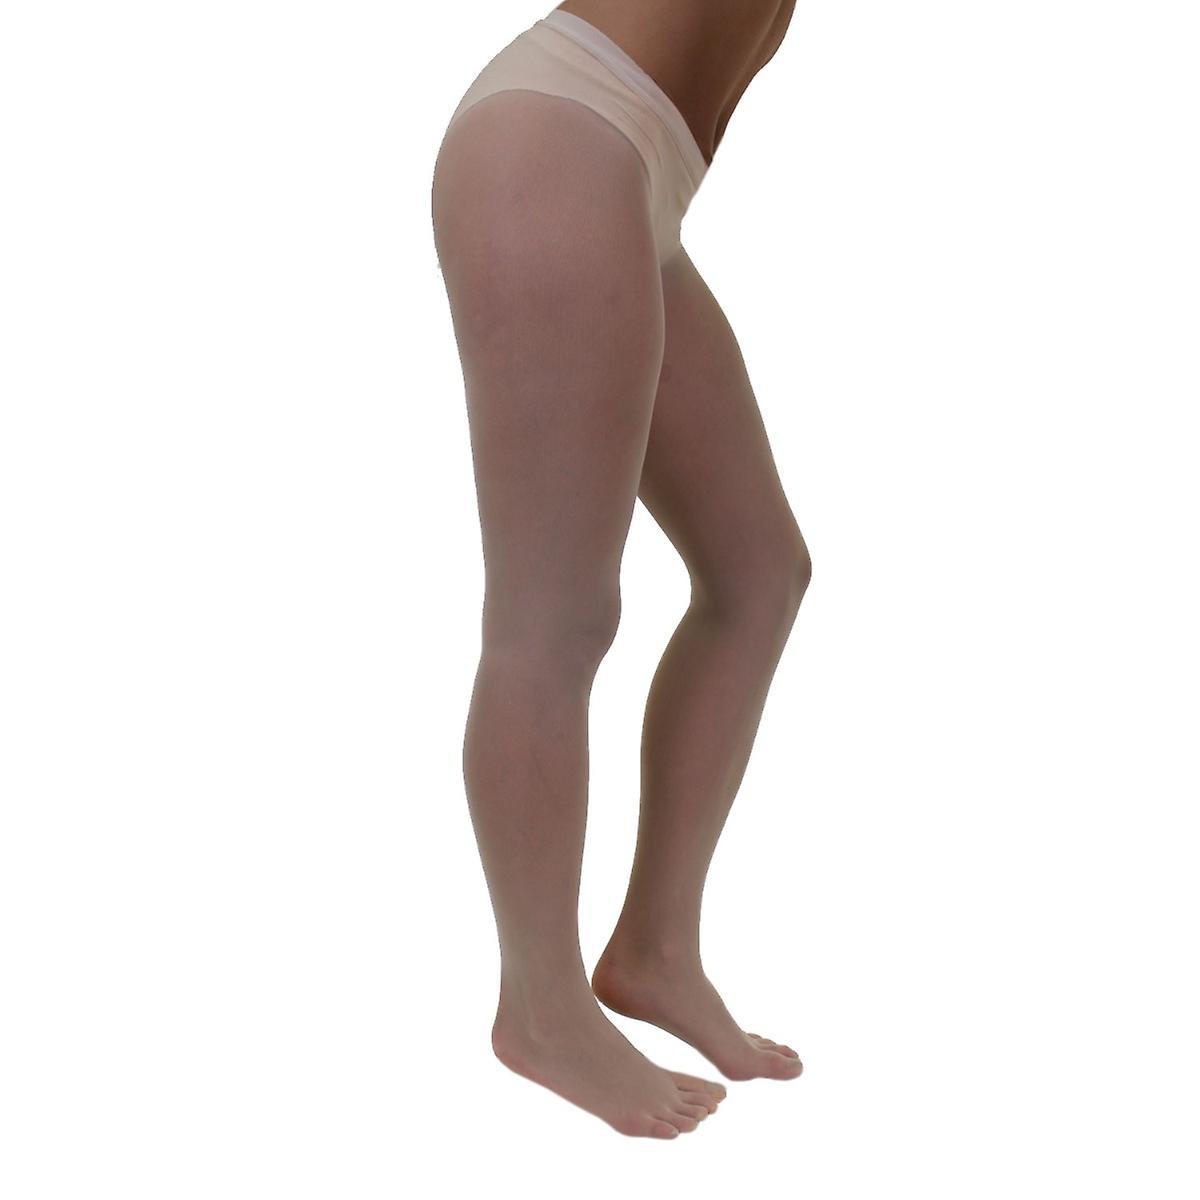 LEGWEAR - Plain Nylon Toe Tights